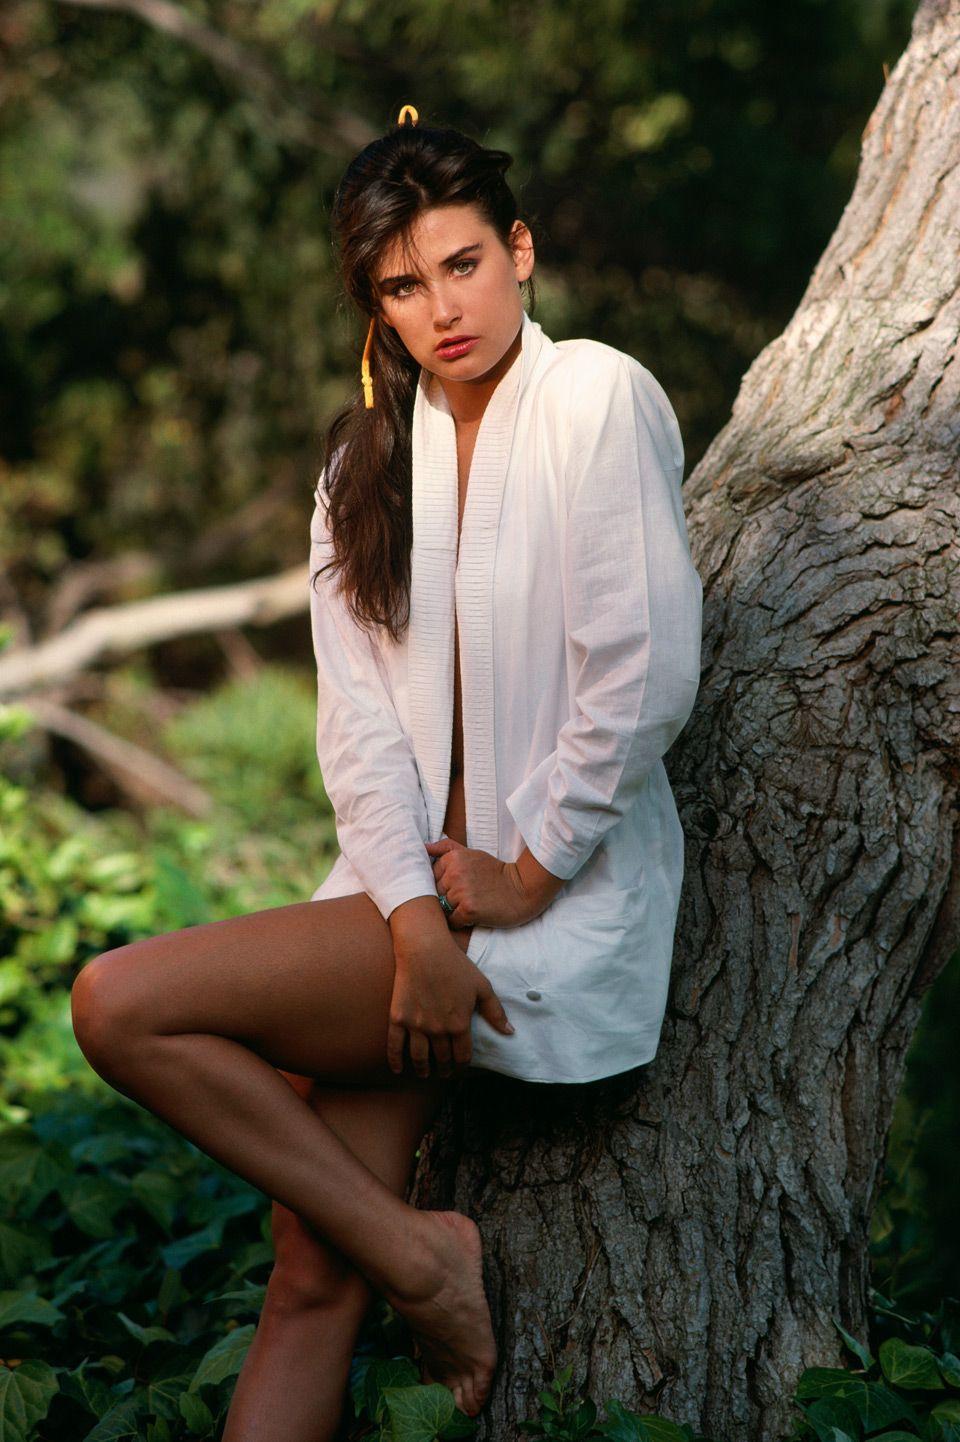 1982 год. 20-летняя Дэми. Фото: Michael Childers